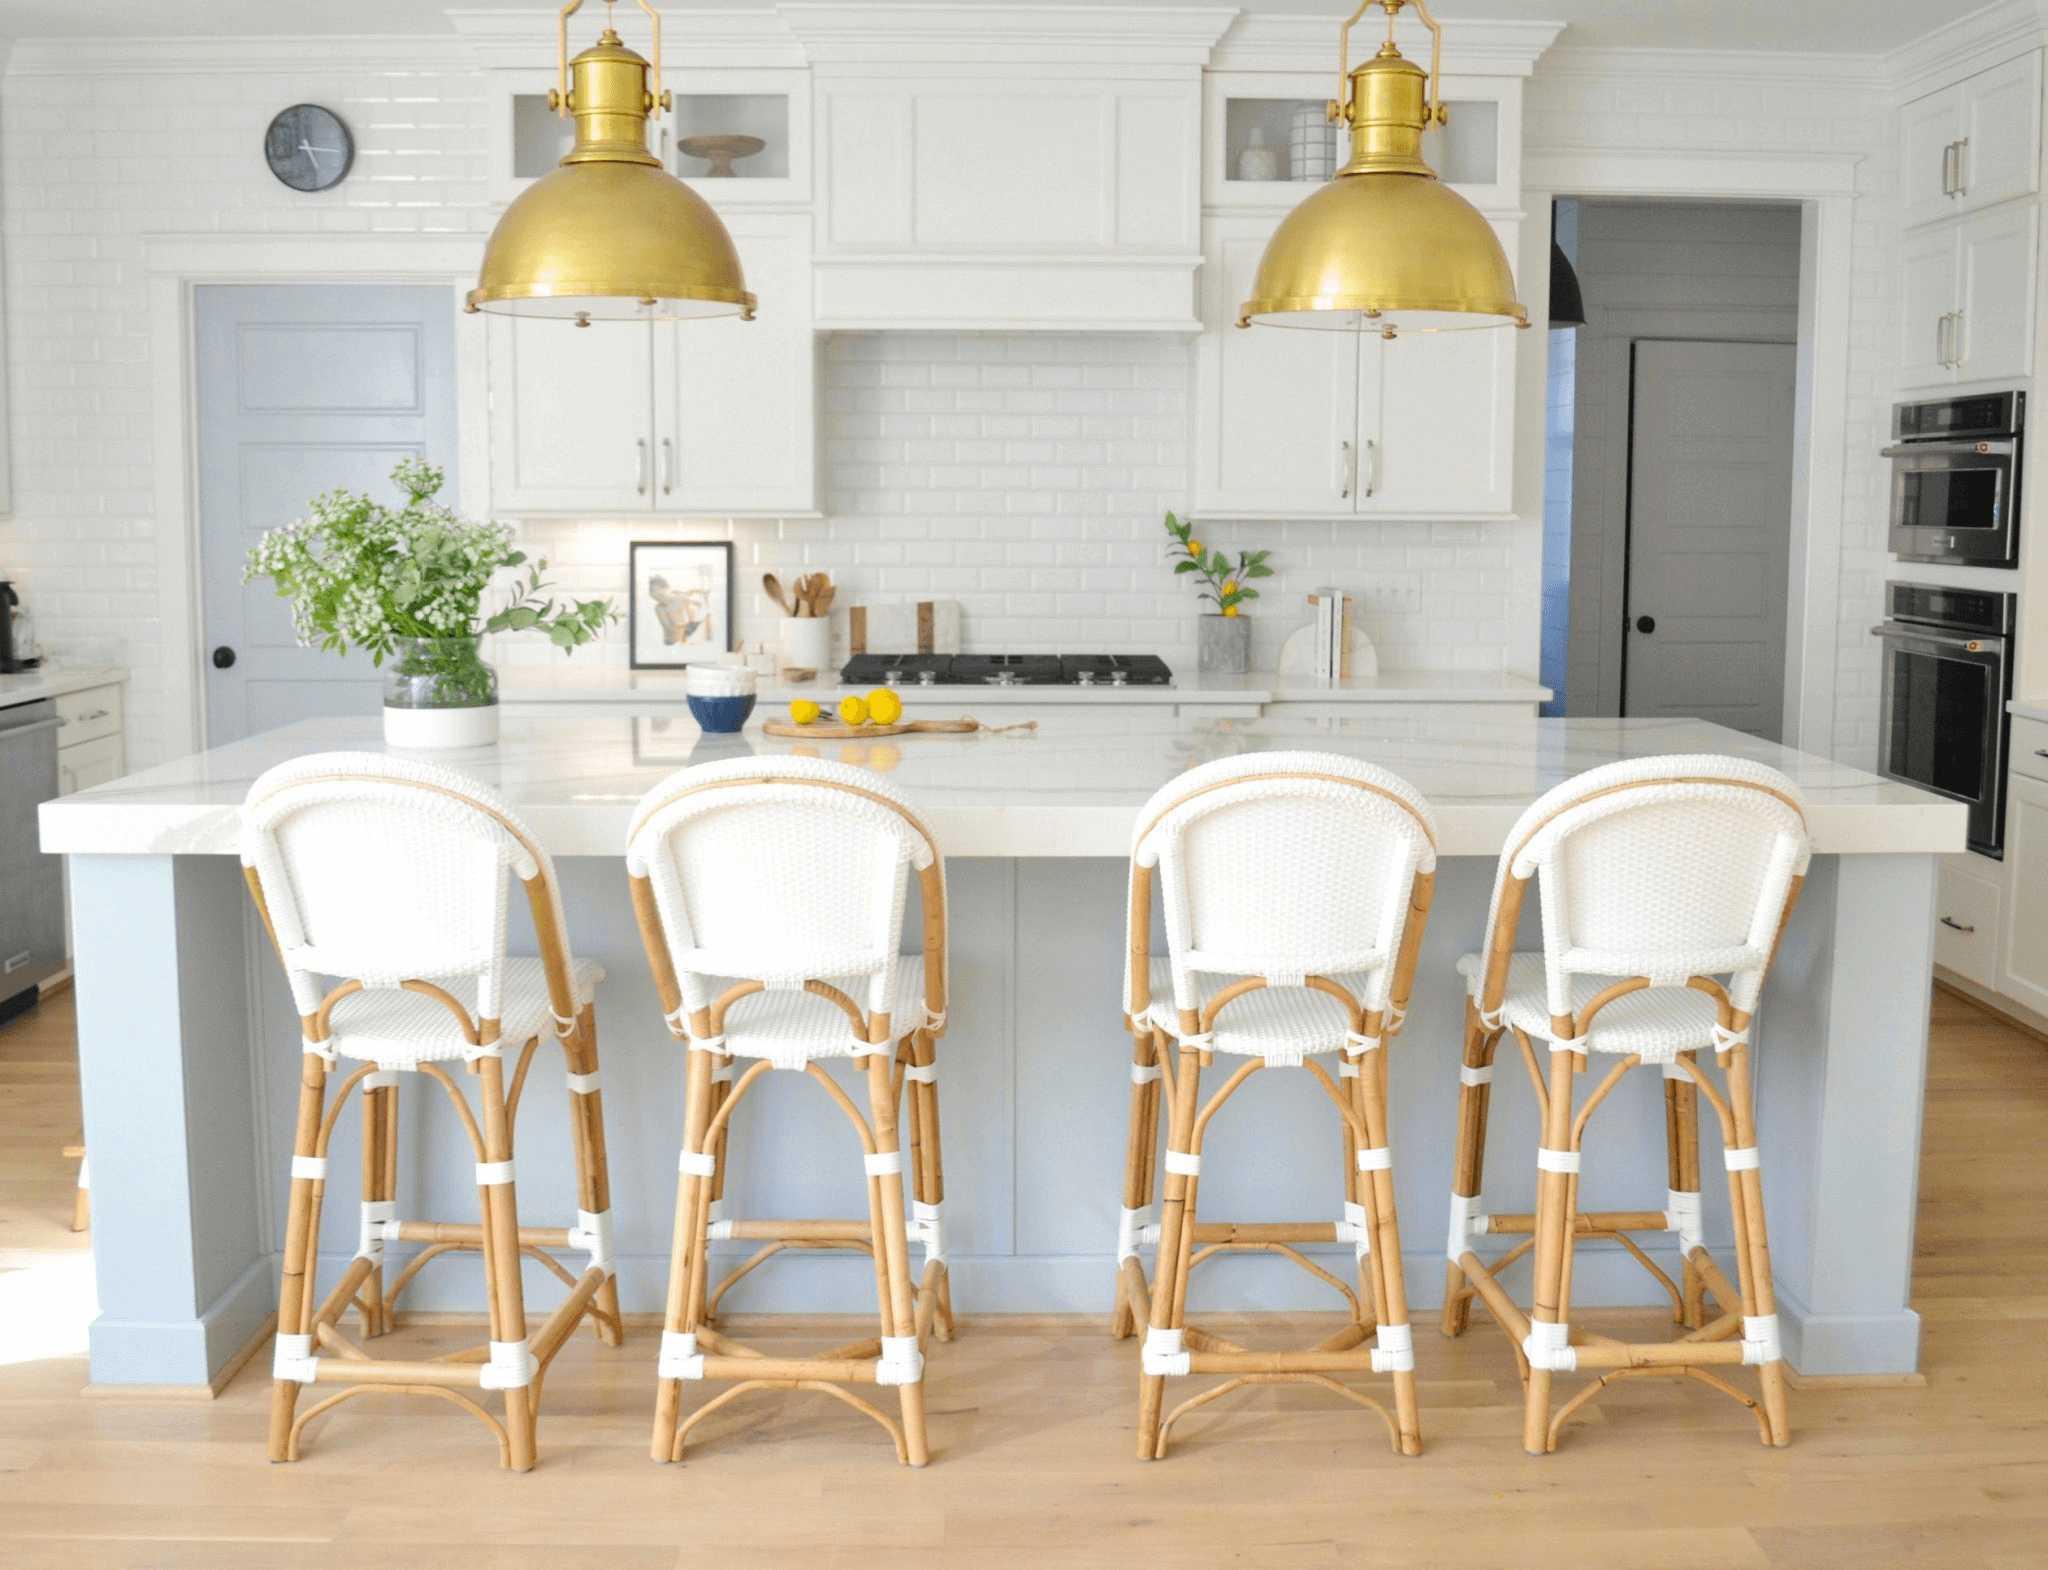 this-is-a-coastal-farmhouse-kitchen-with-marble-kitchen-island